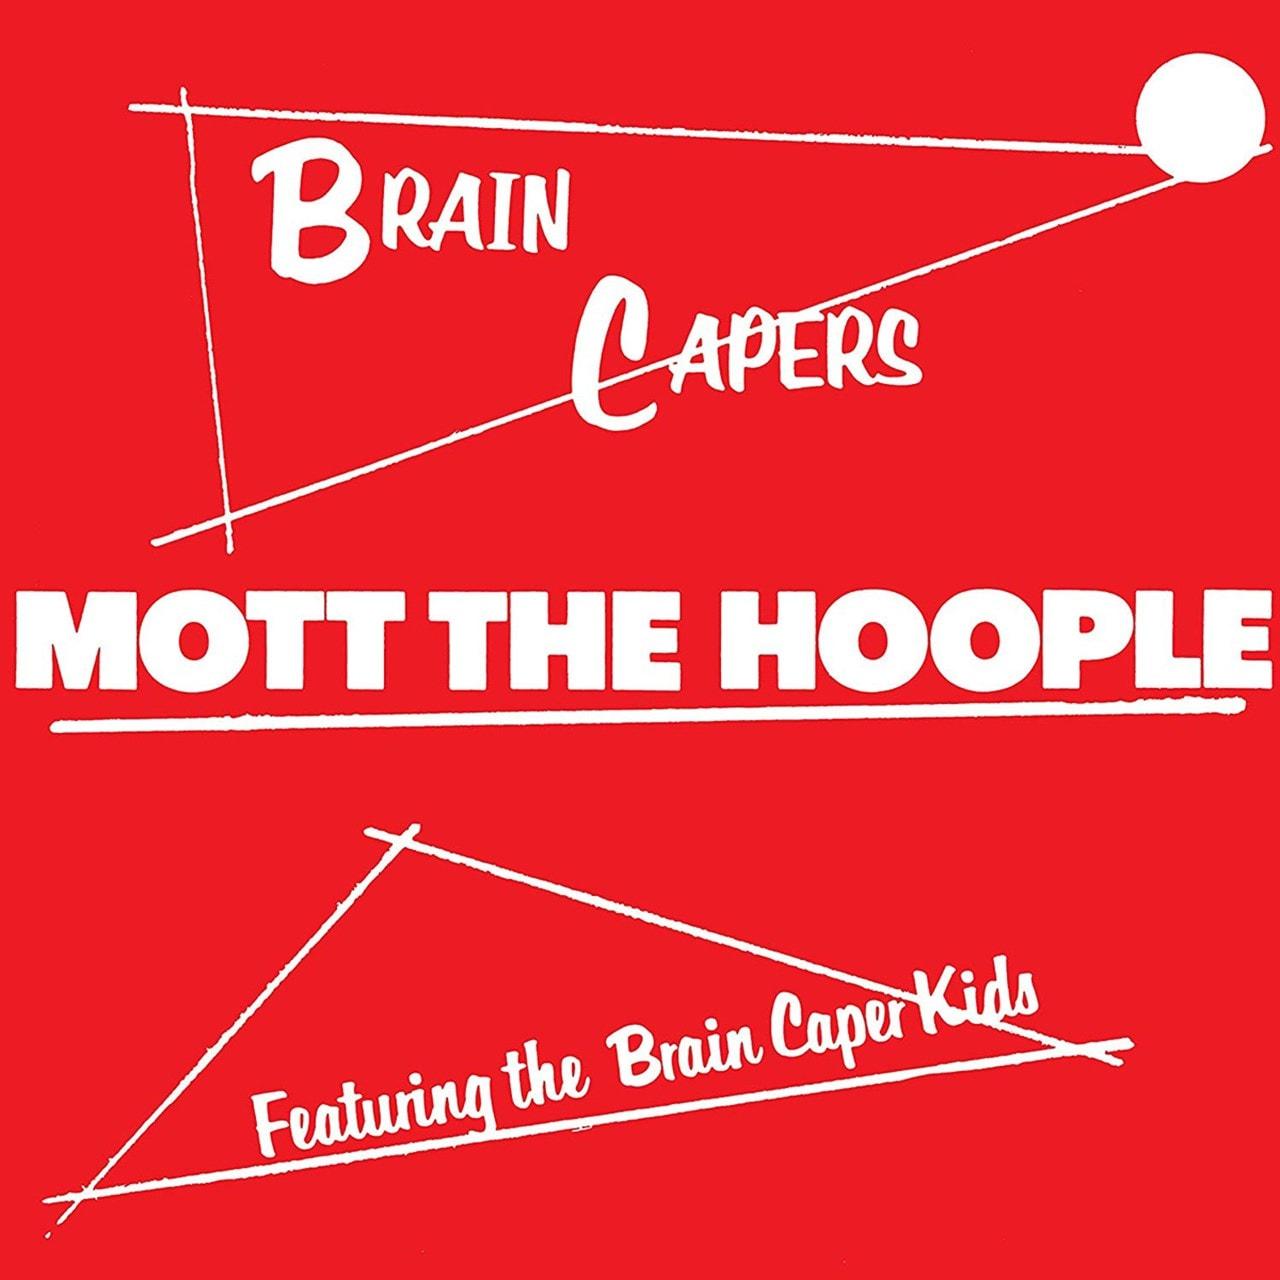 Brain Capers - 1